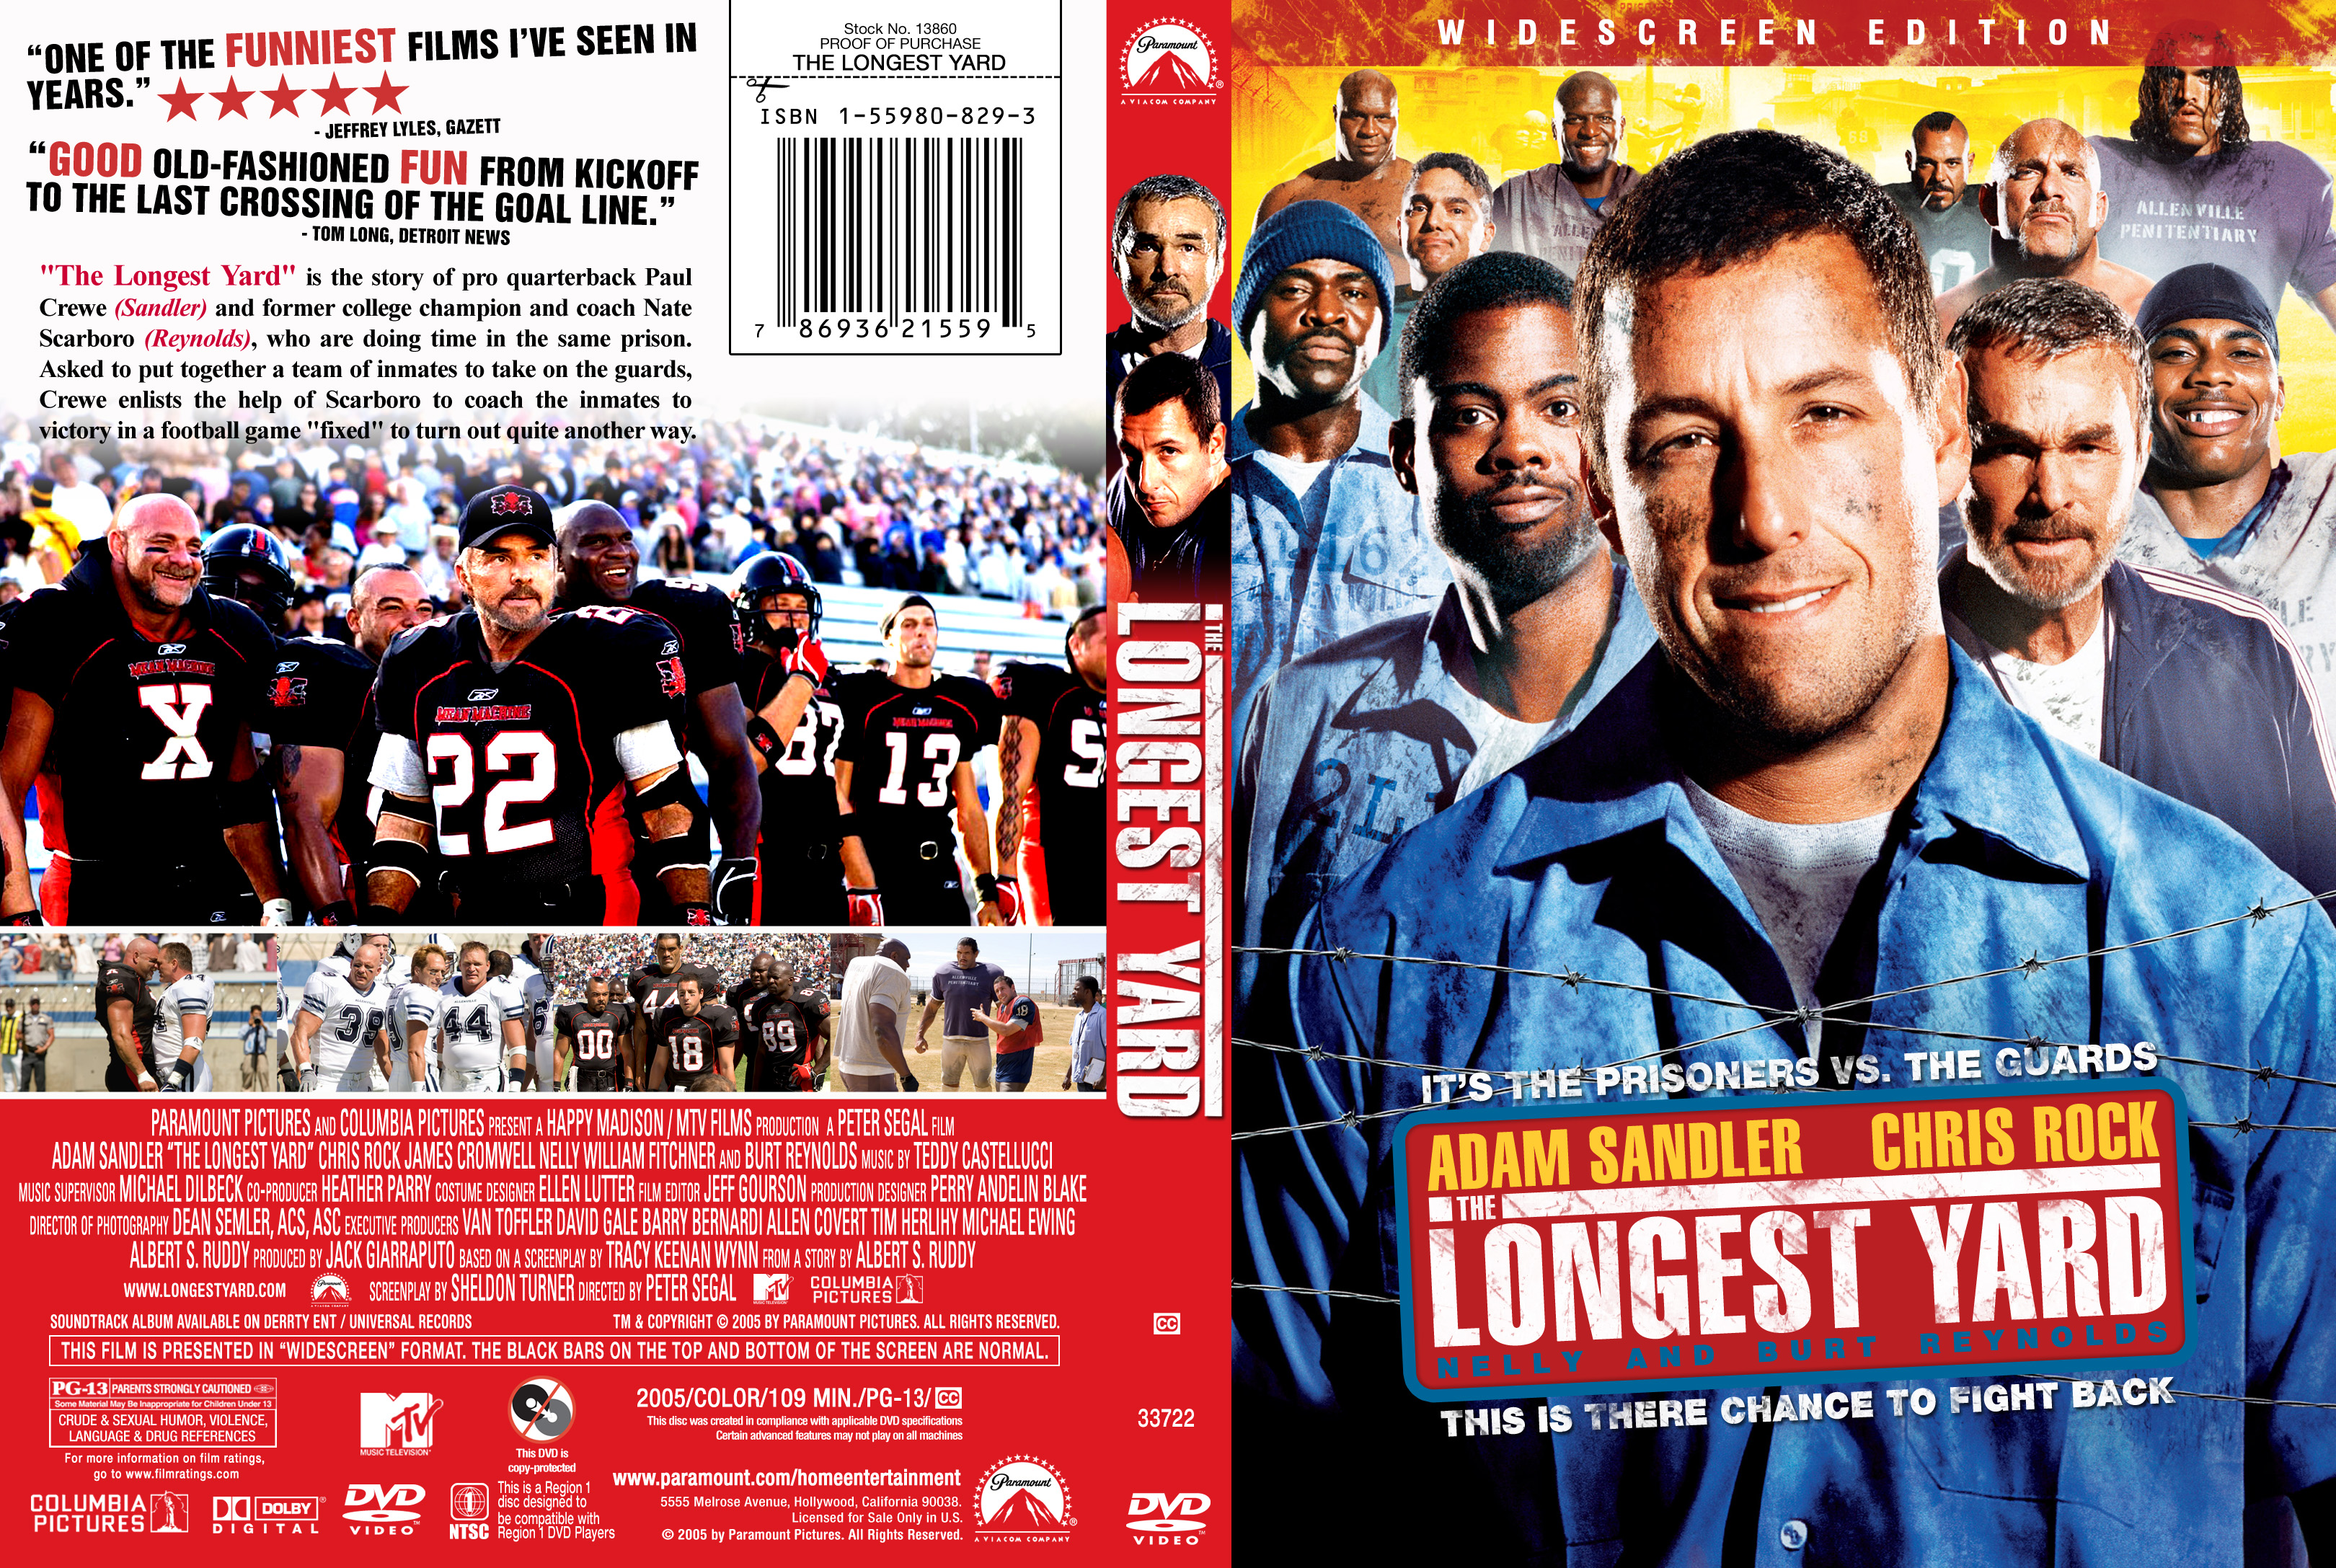 The Longest Yard (2005) Movie The Longest Yard 2005